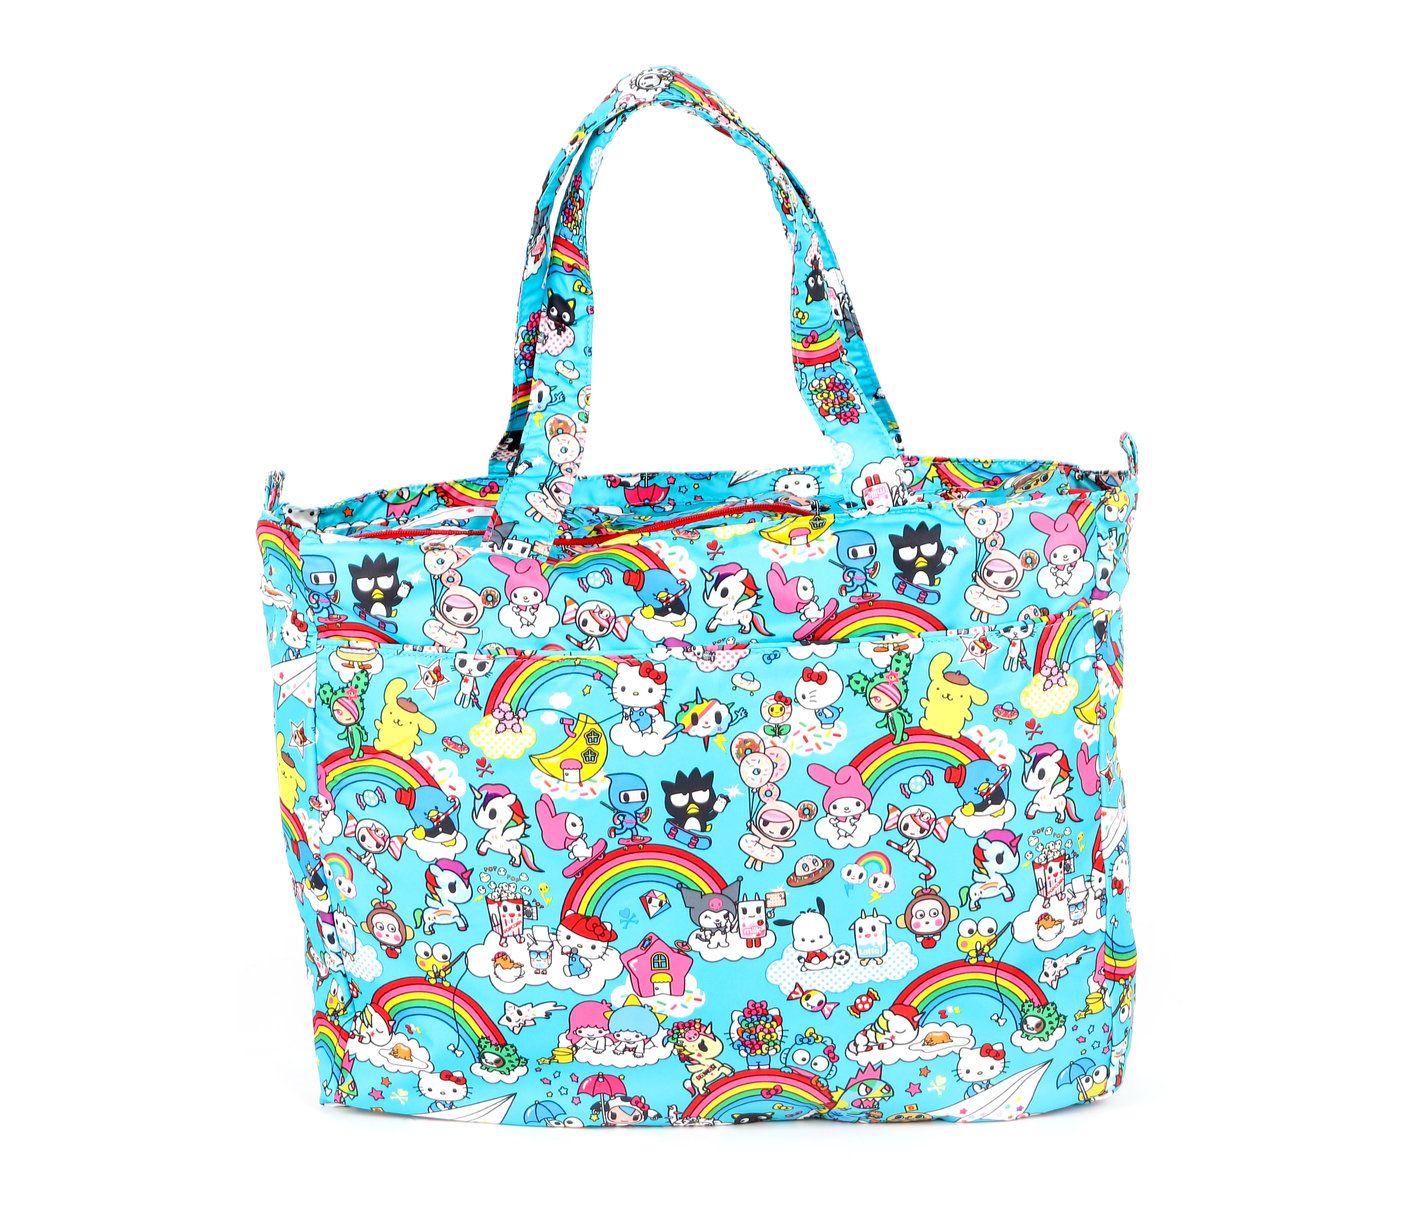 194e1f5c87c4 tokidoki for hello sanrio by Ju-Ju-Be Super Be Tote Bag  Rainbow Dreams